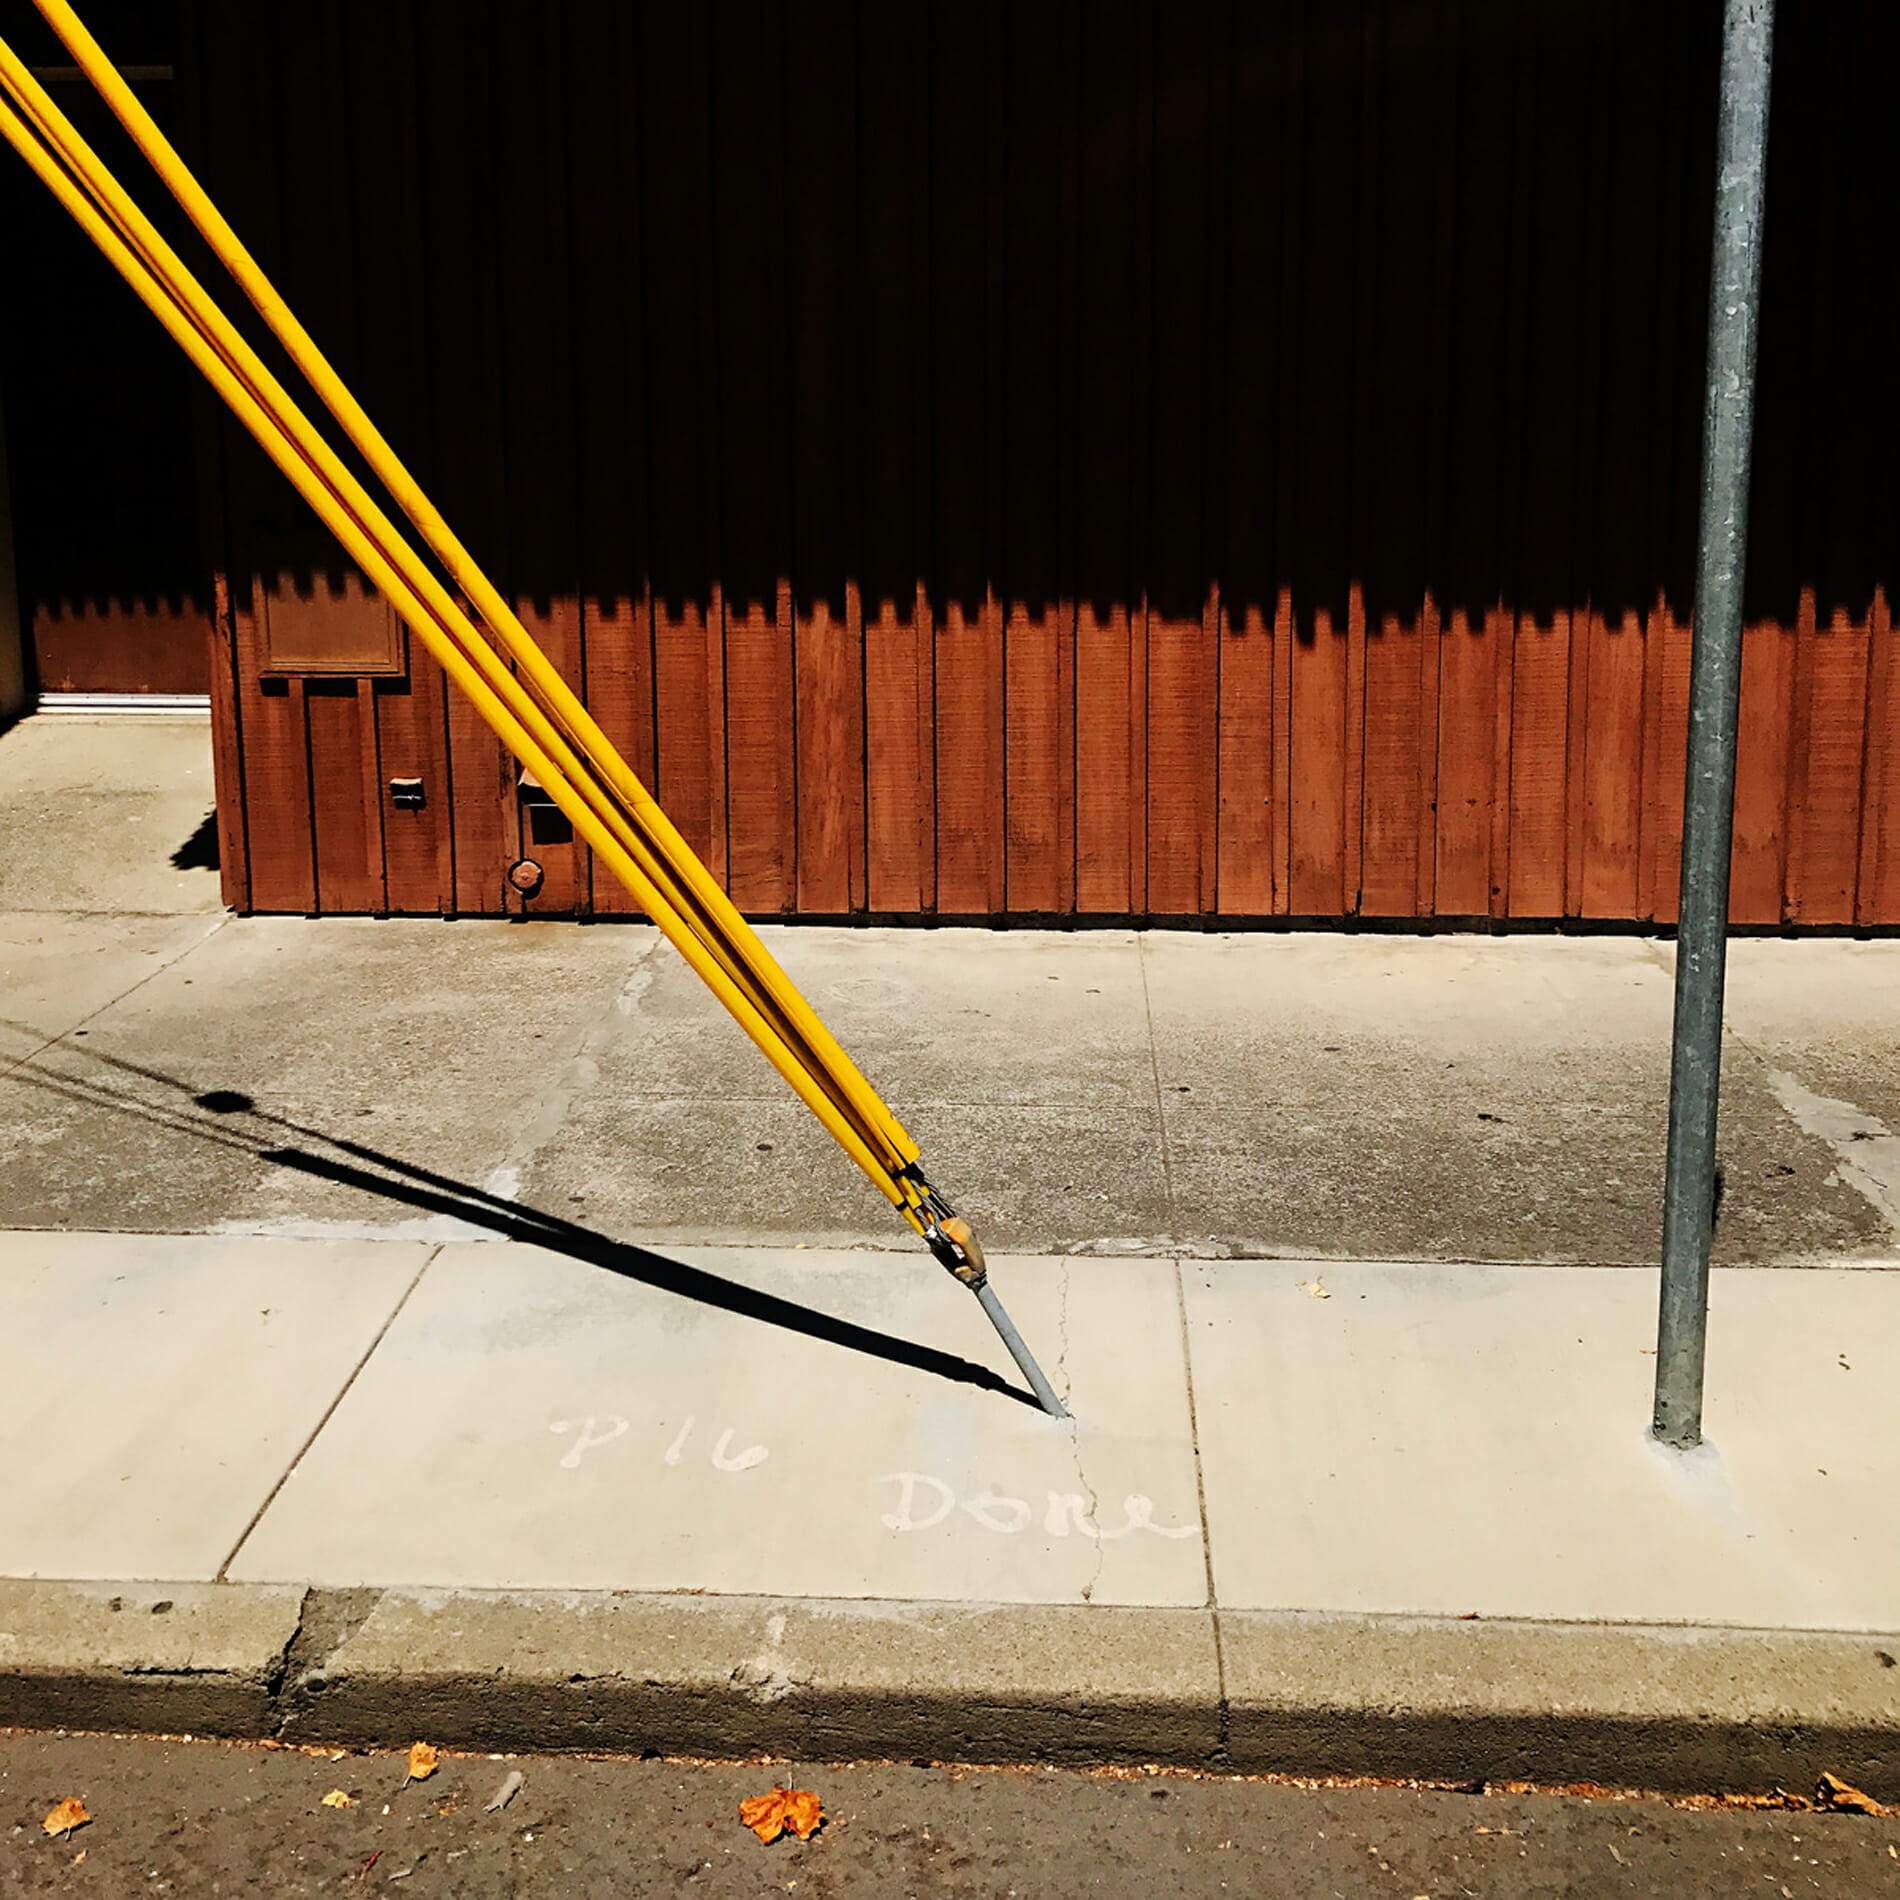 Sidewalk Calistoga